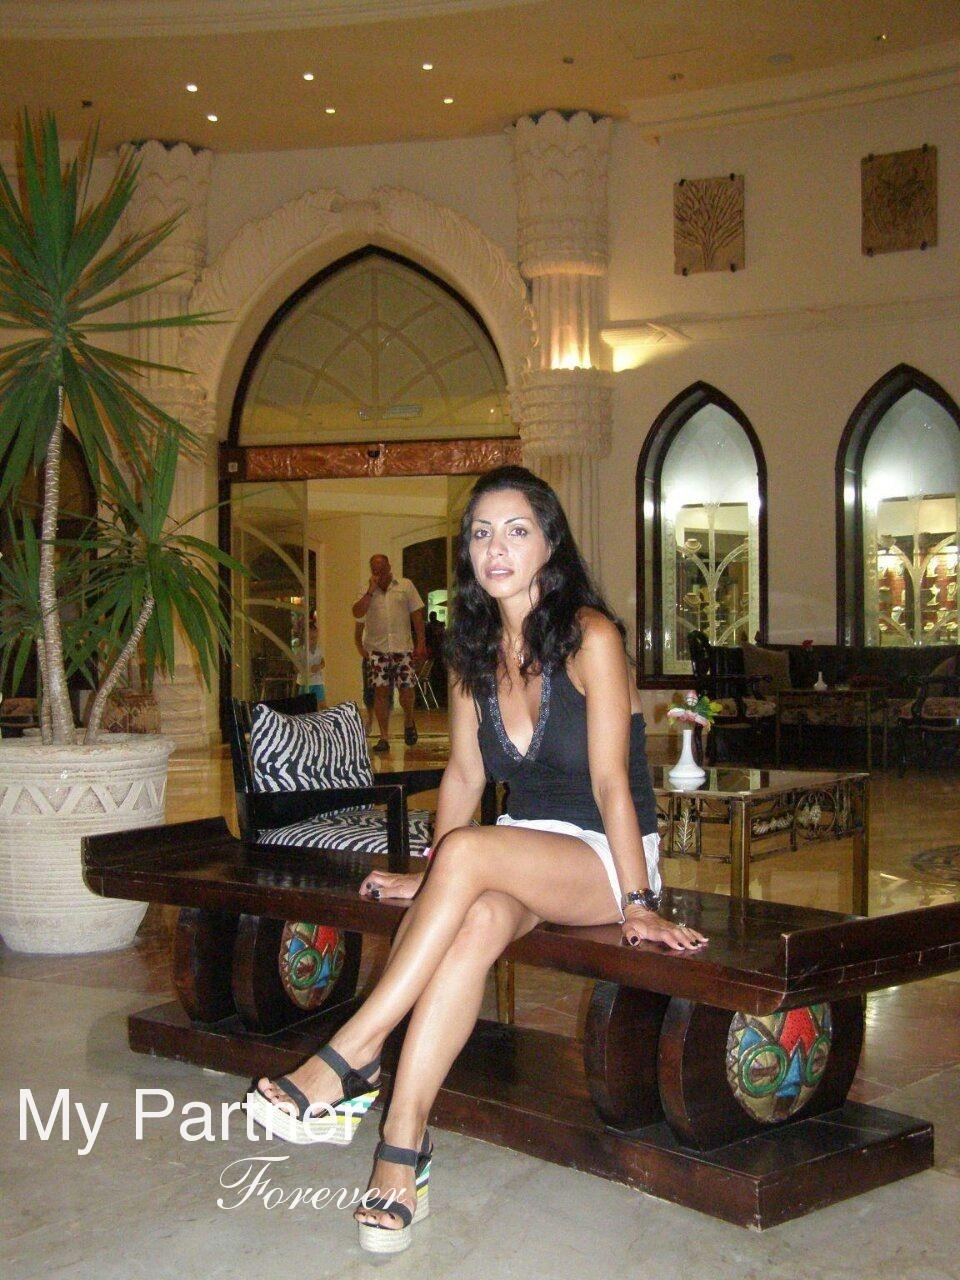 International Datingsite to Meet Arina from Kiev, Ukraine